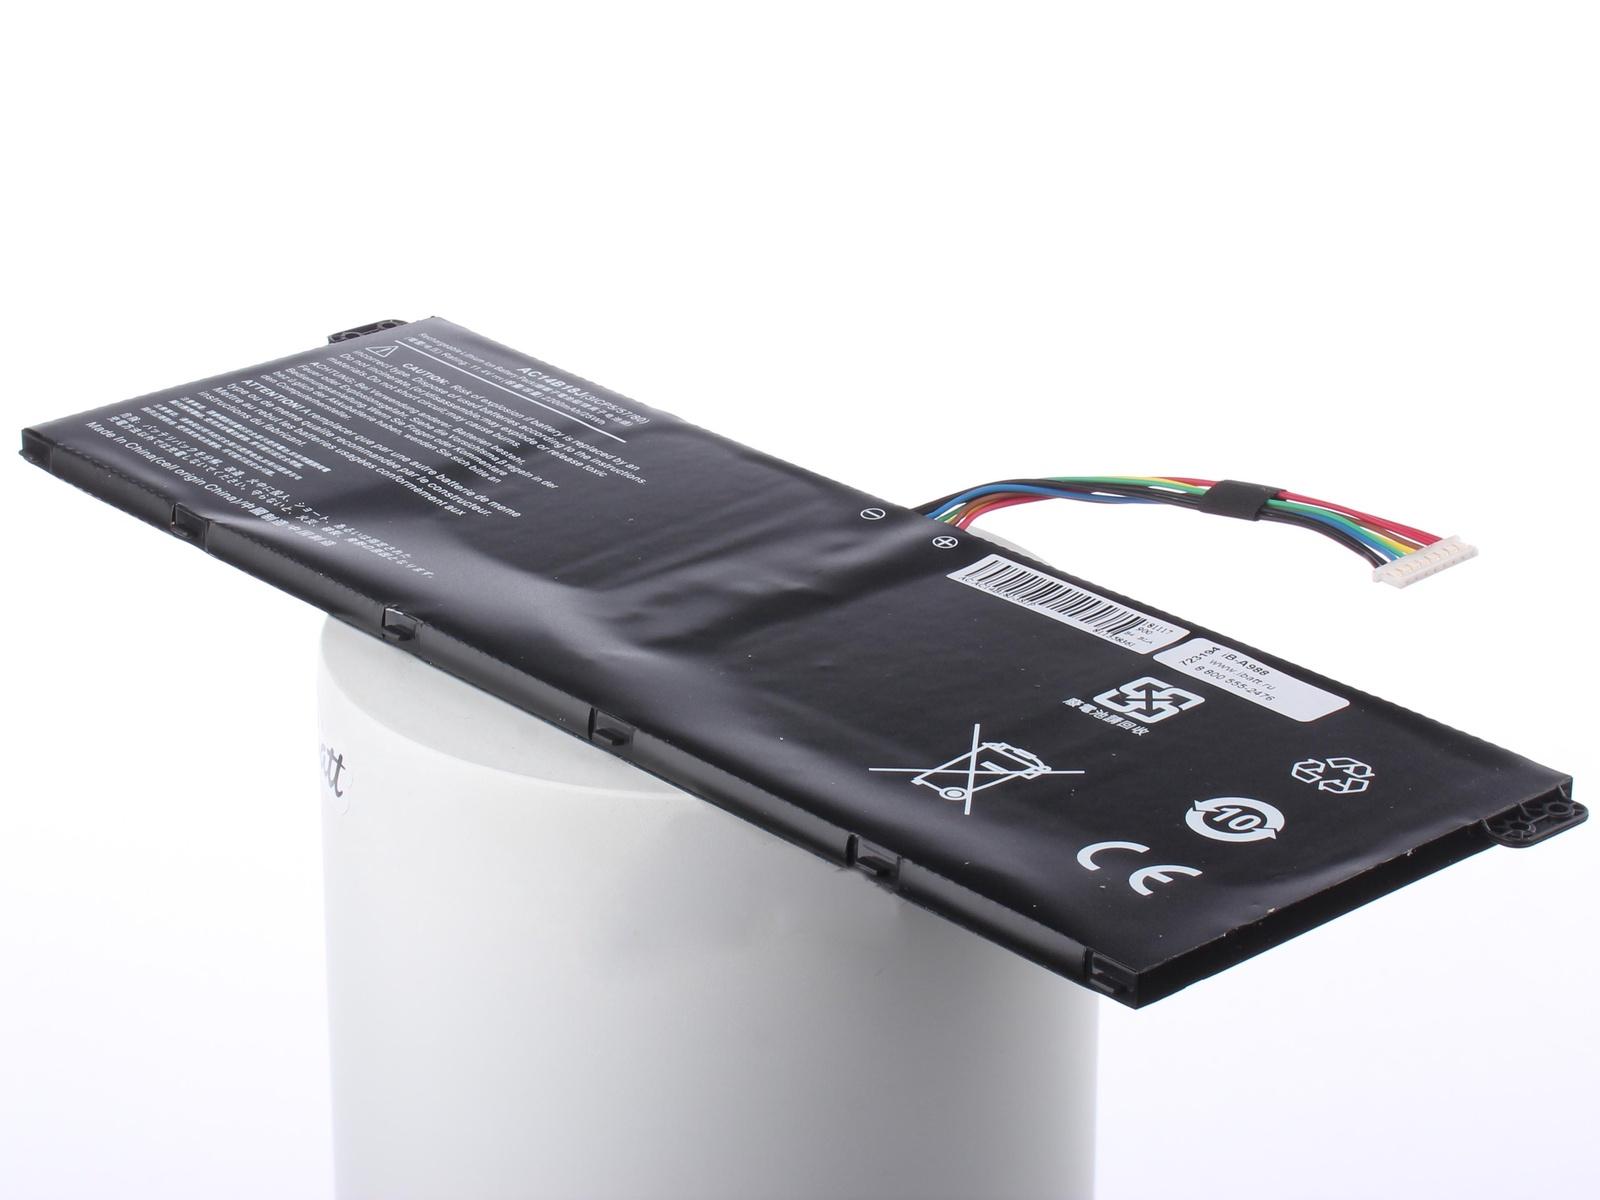 Аккумуляторная батарея iBatt iB-A1-A988 3220mAh для ноутбуков Acer, Packard Bell AC14B13J, iB-A988, KT. 00303. 016, 3INP5/60/80, iBatt